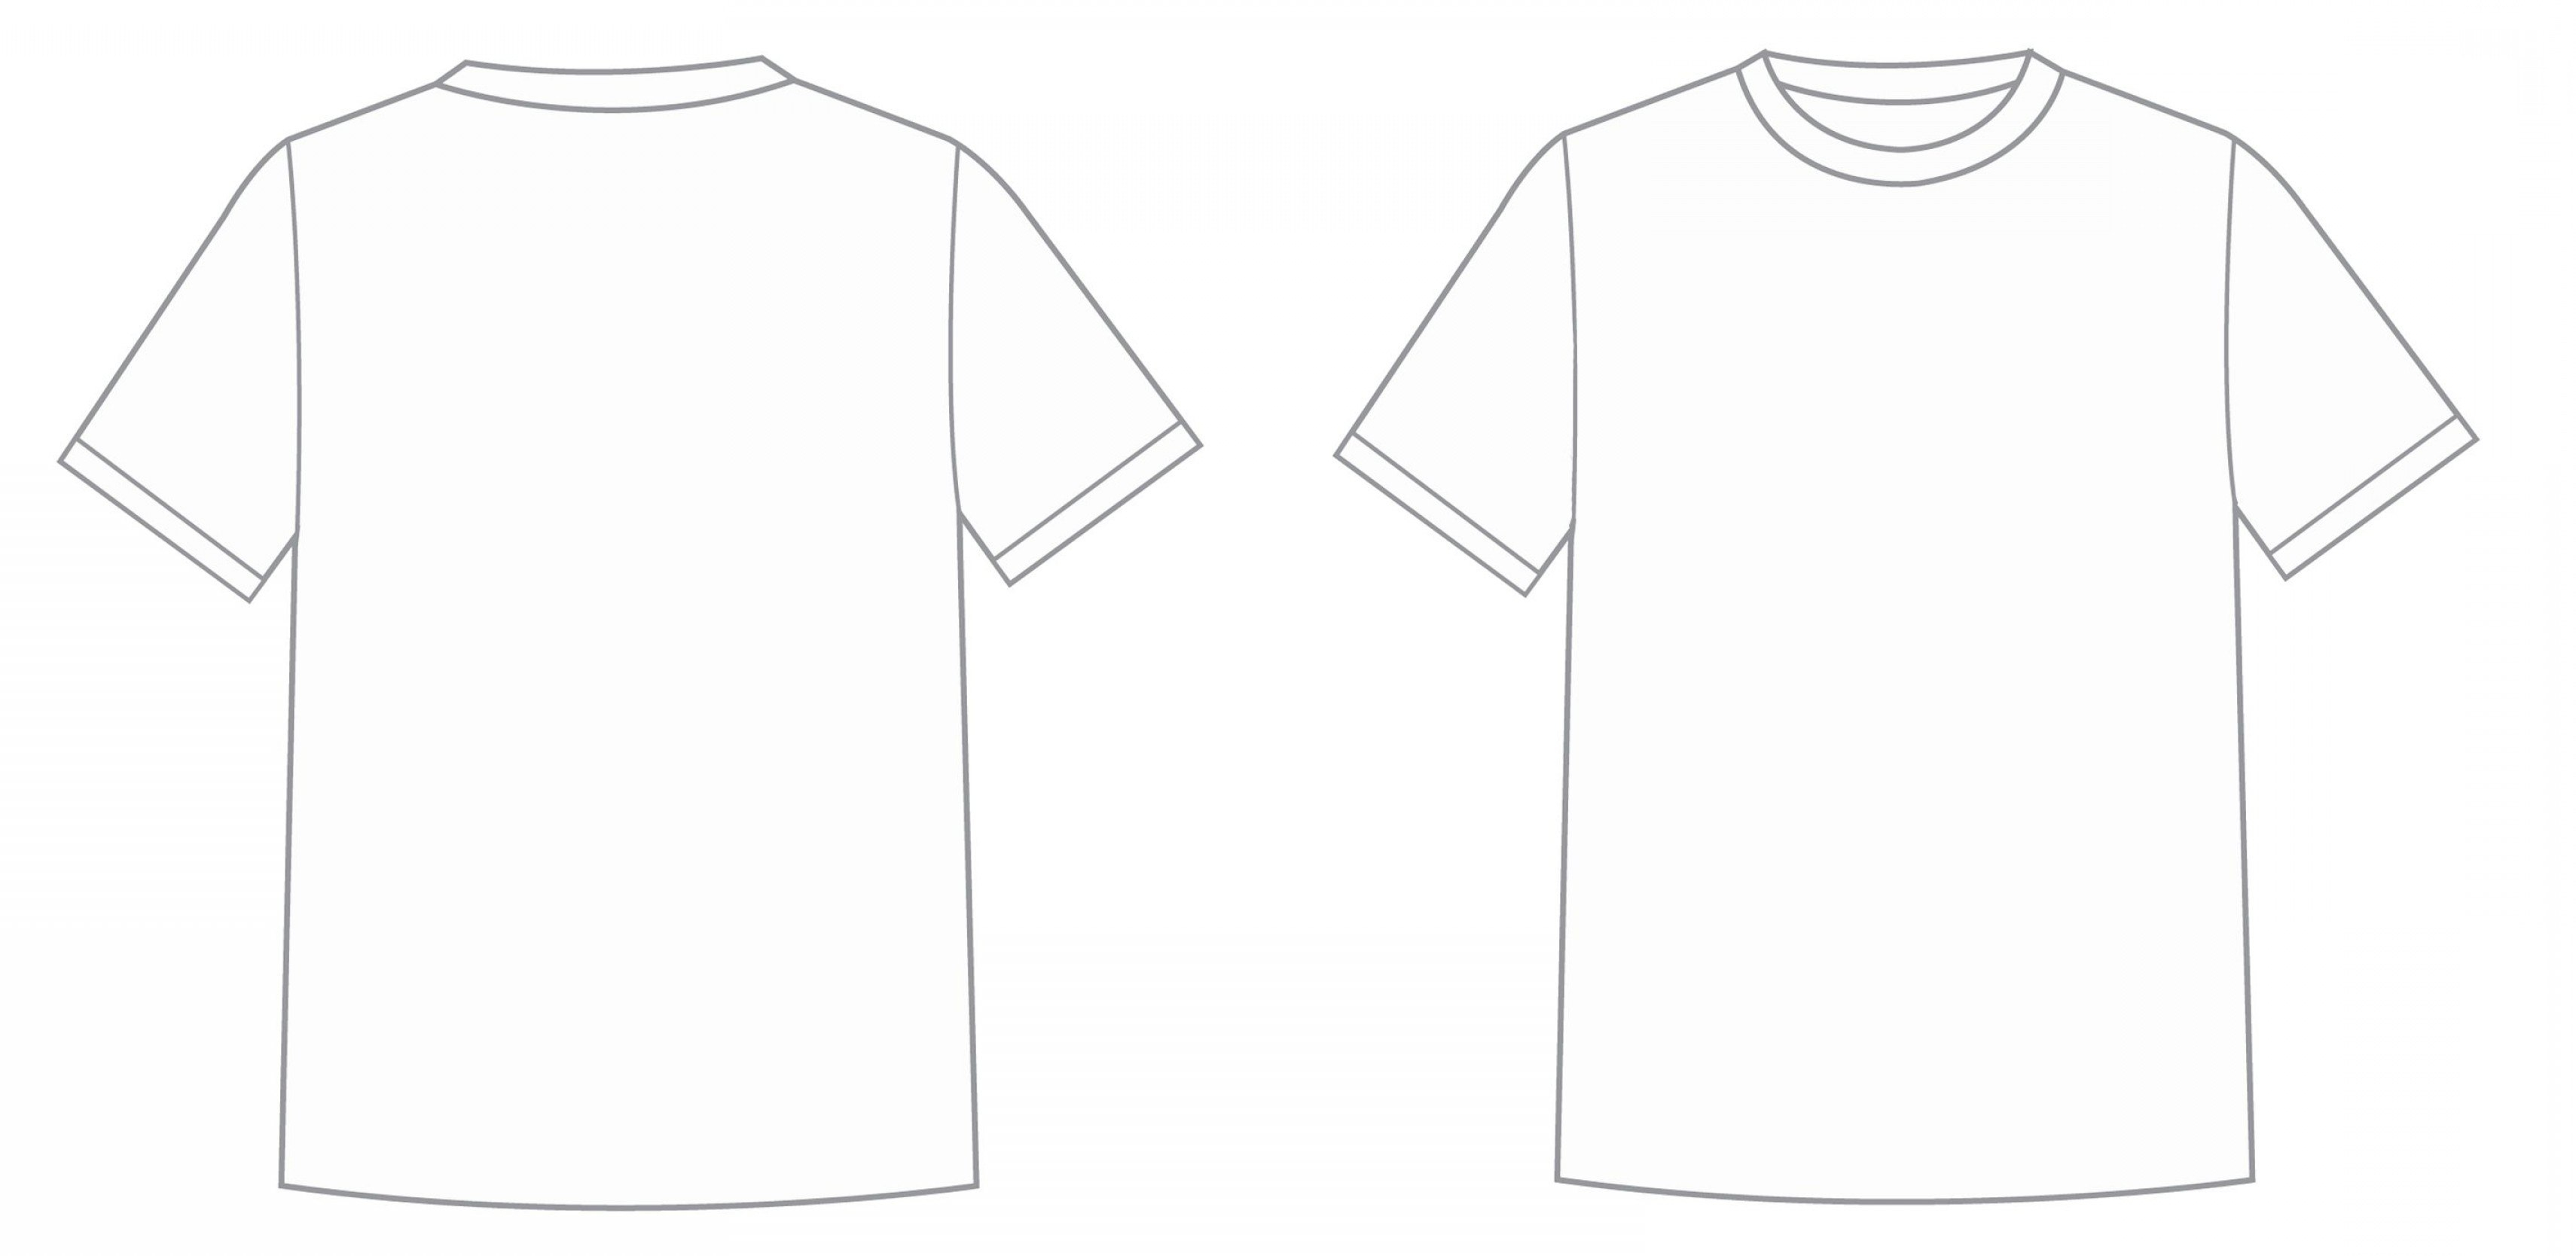 Blank Tee Shirt Template Luxury Blank T Shirt Outline Template Inside Blank T Shirt Outline Template